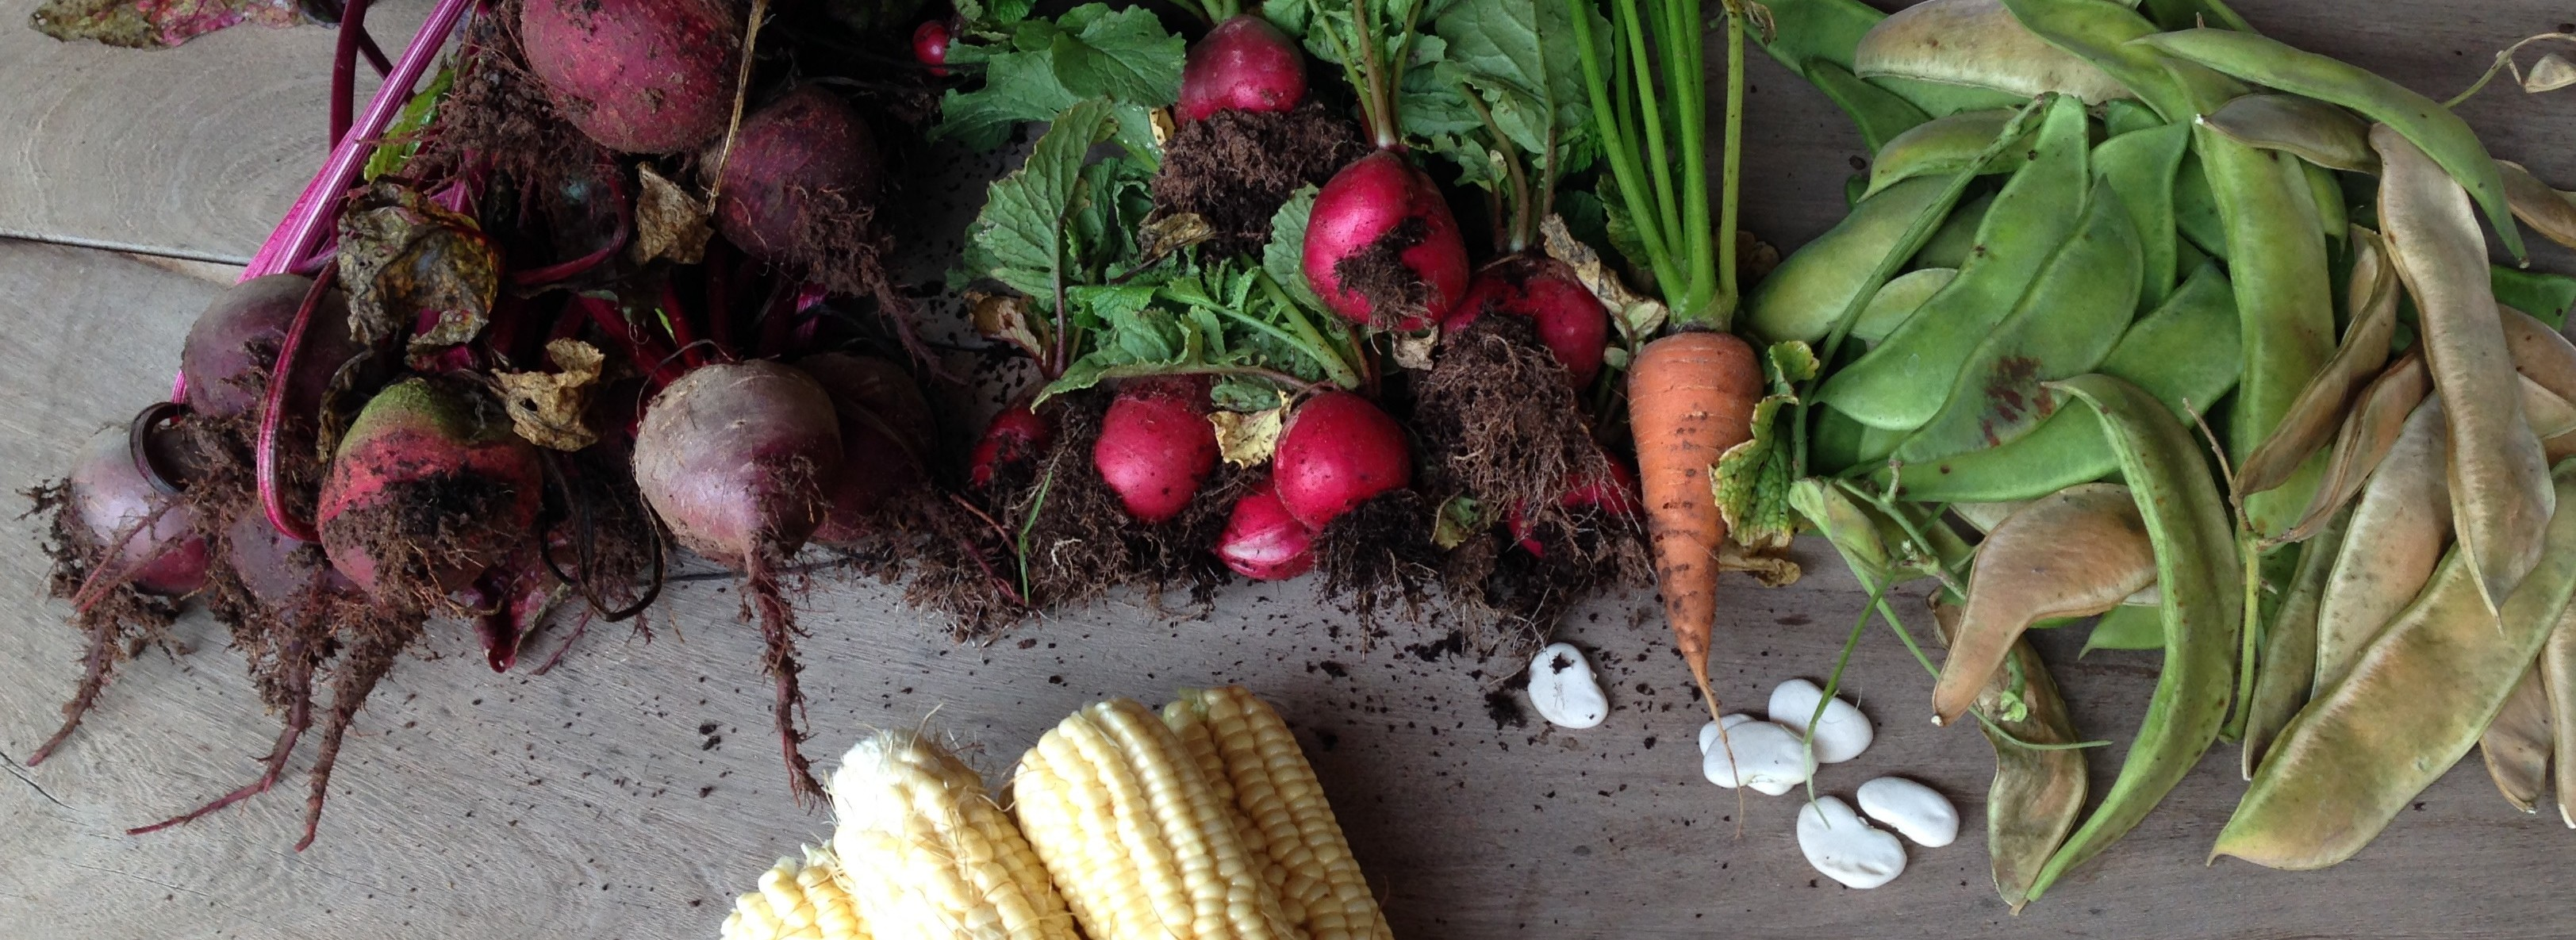 Grow your Food!